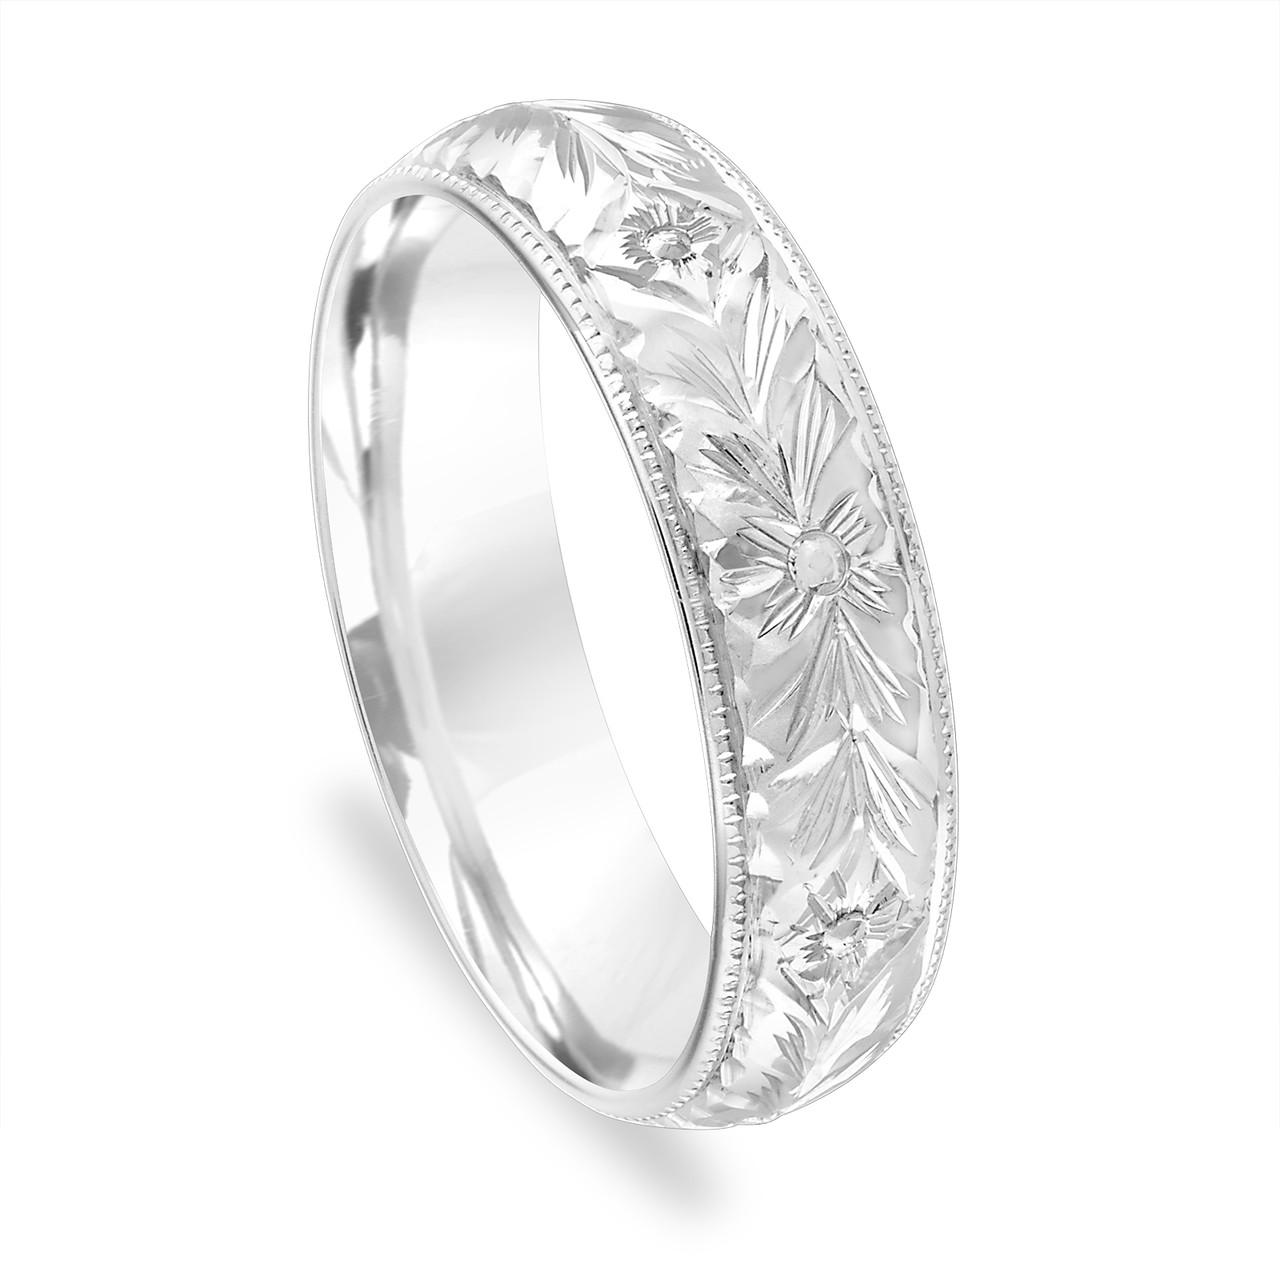 Hand Engraved Men's Wedding Band, Vintage Wedding Ring